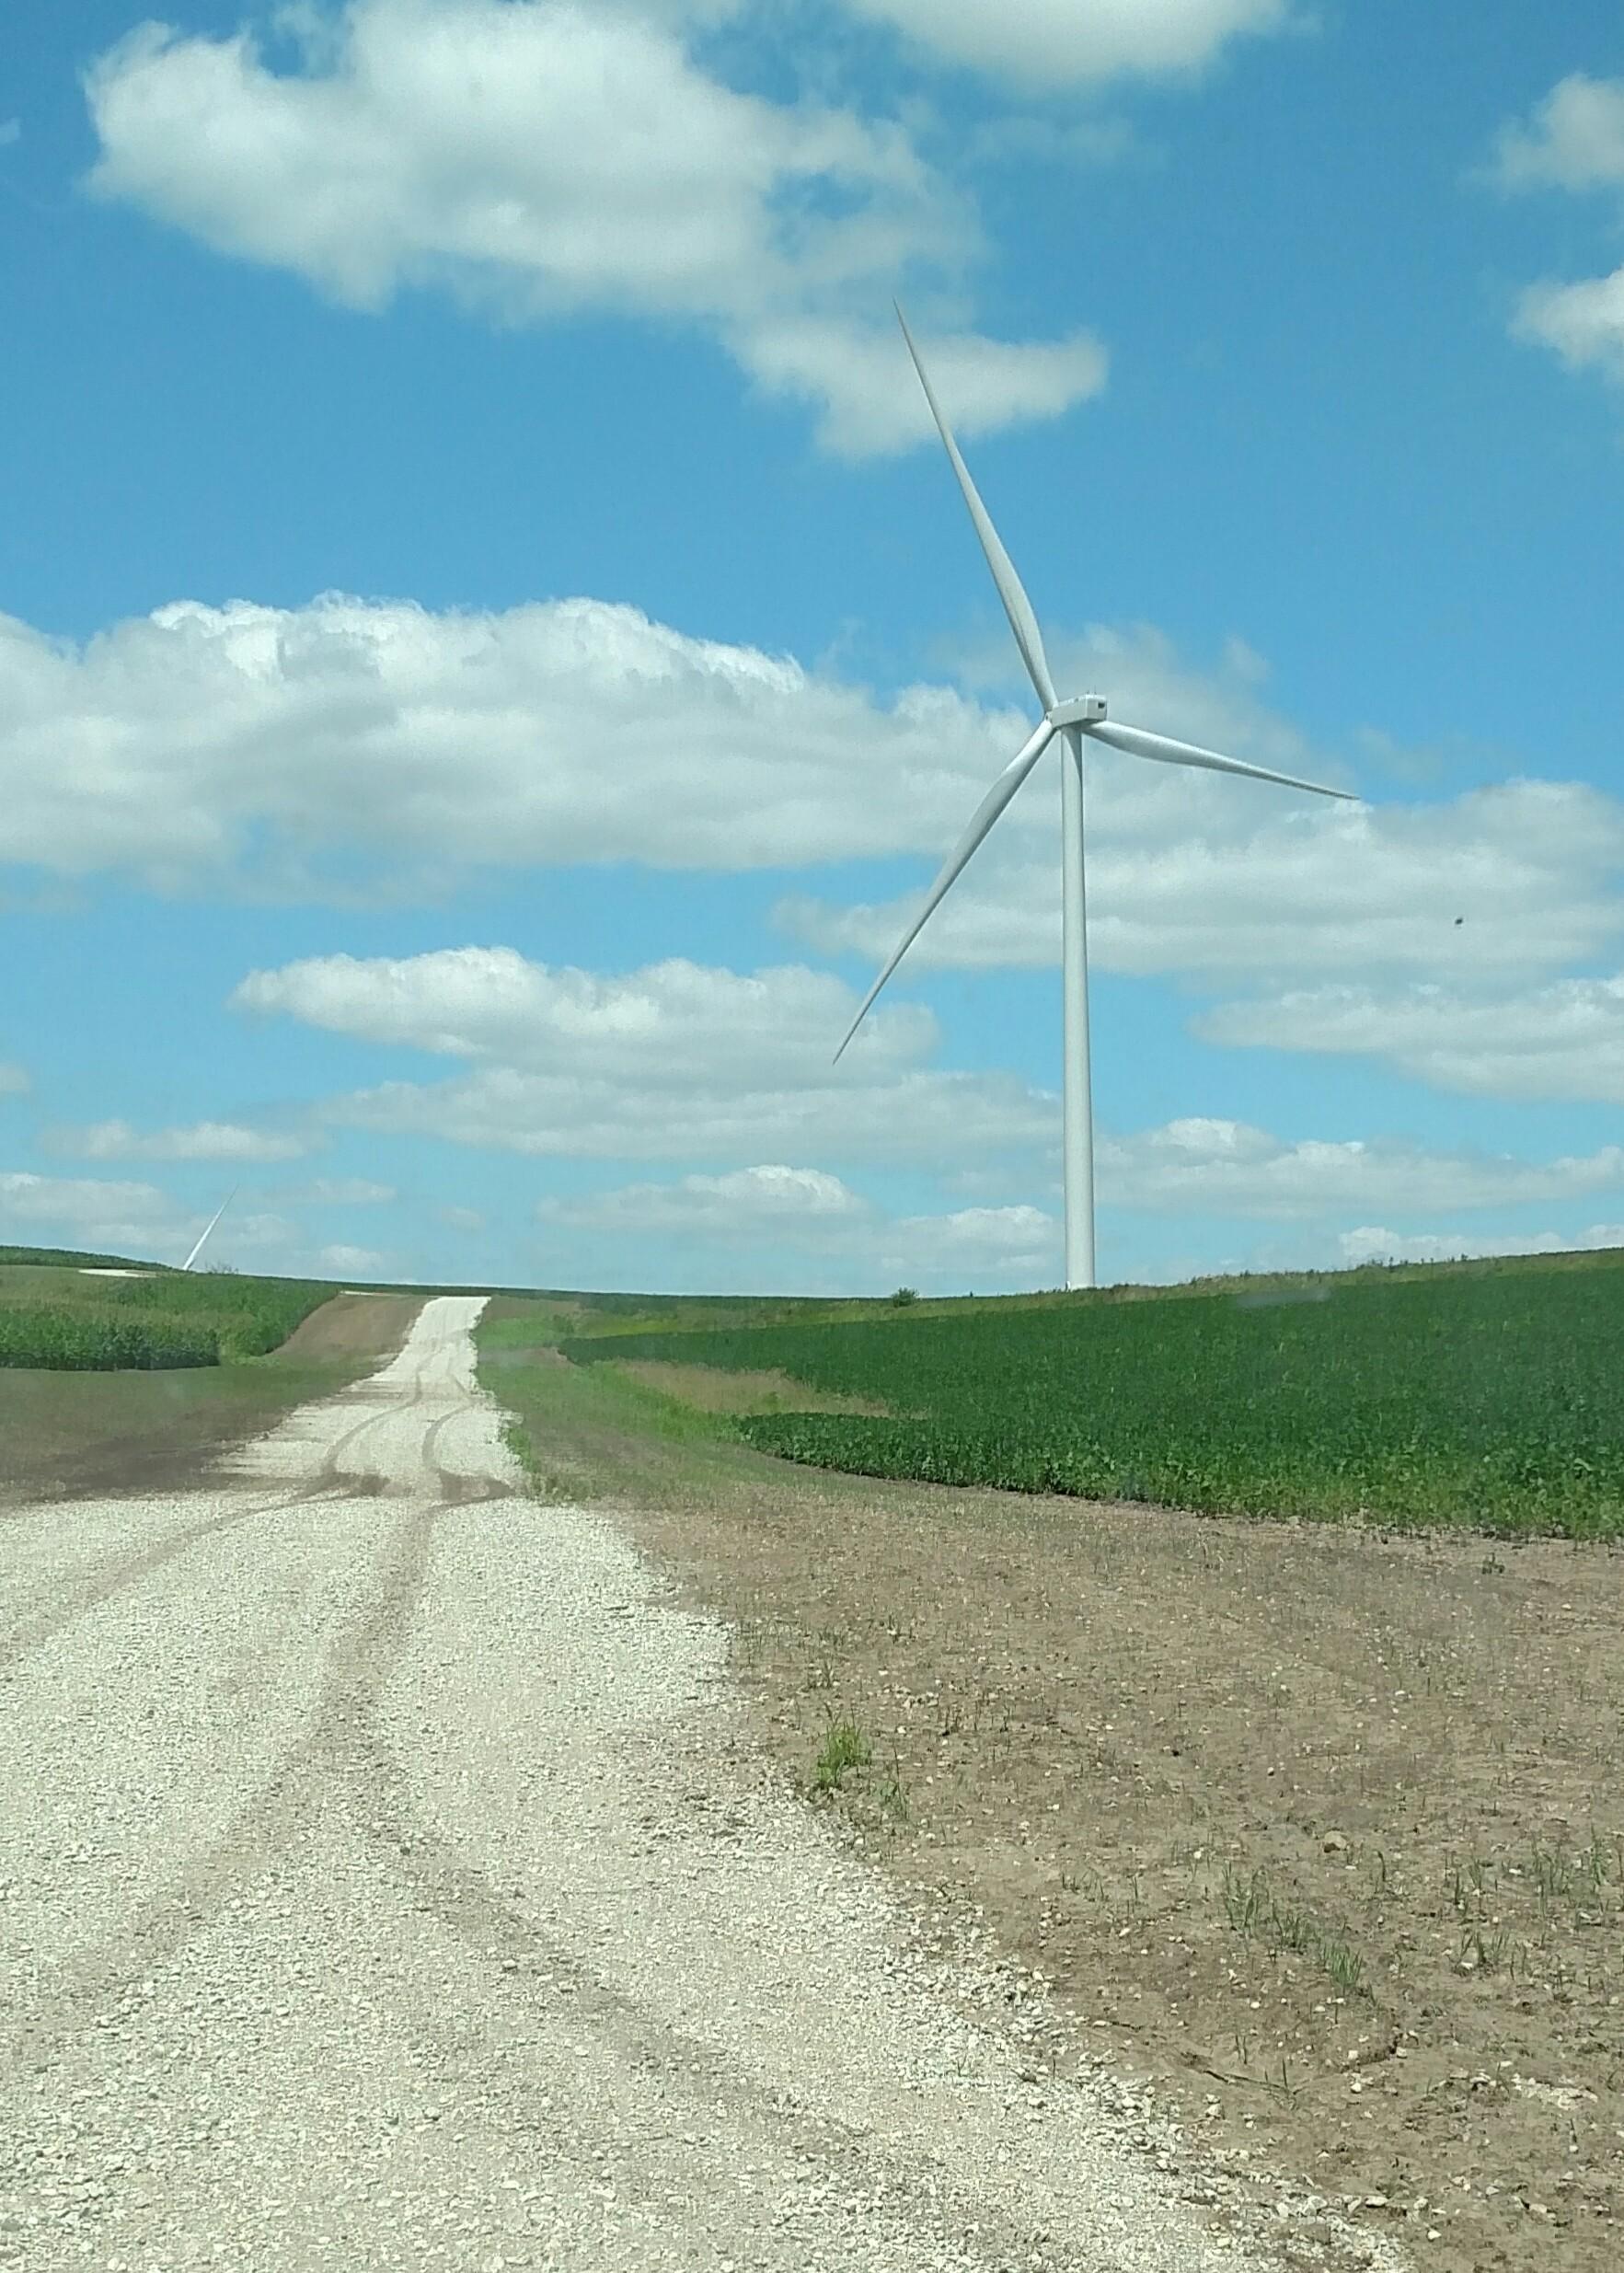 blog photo of wind turbine